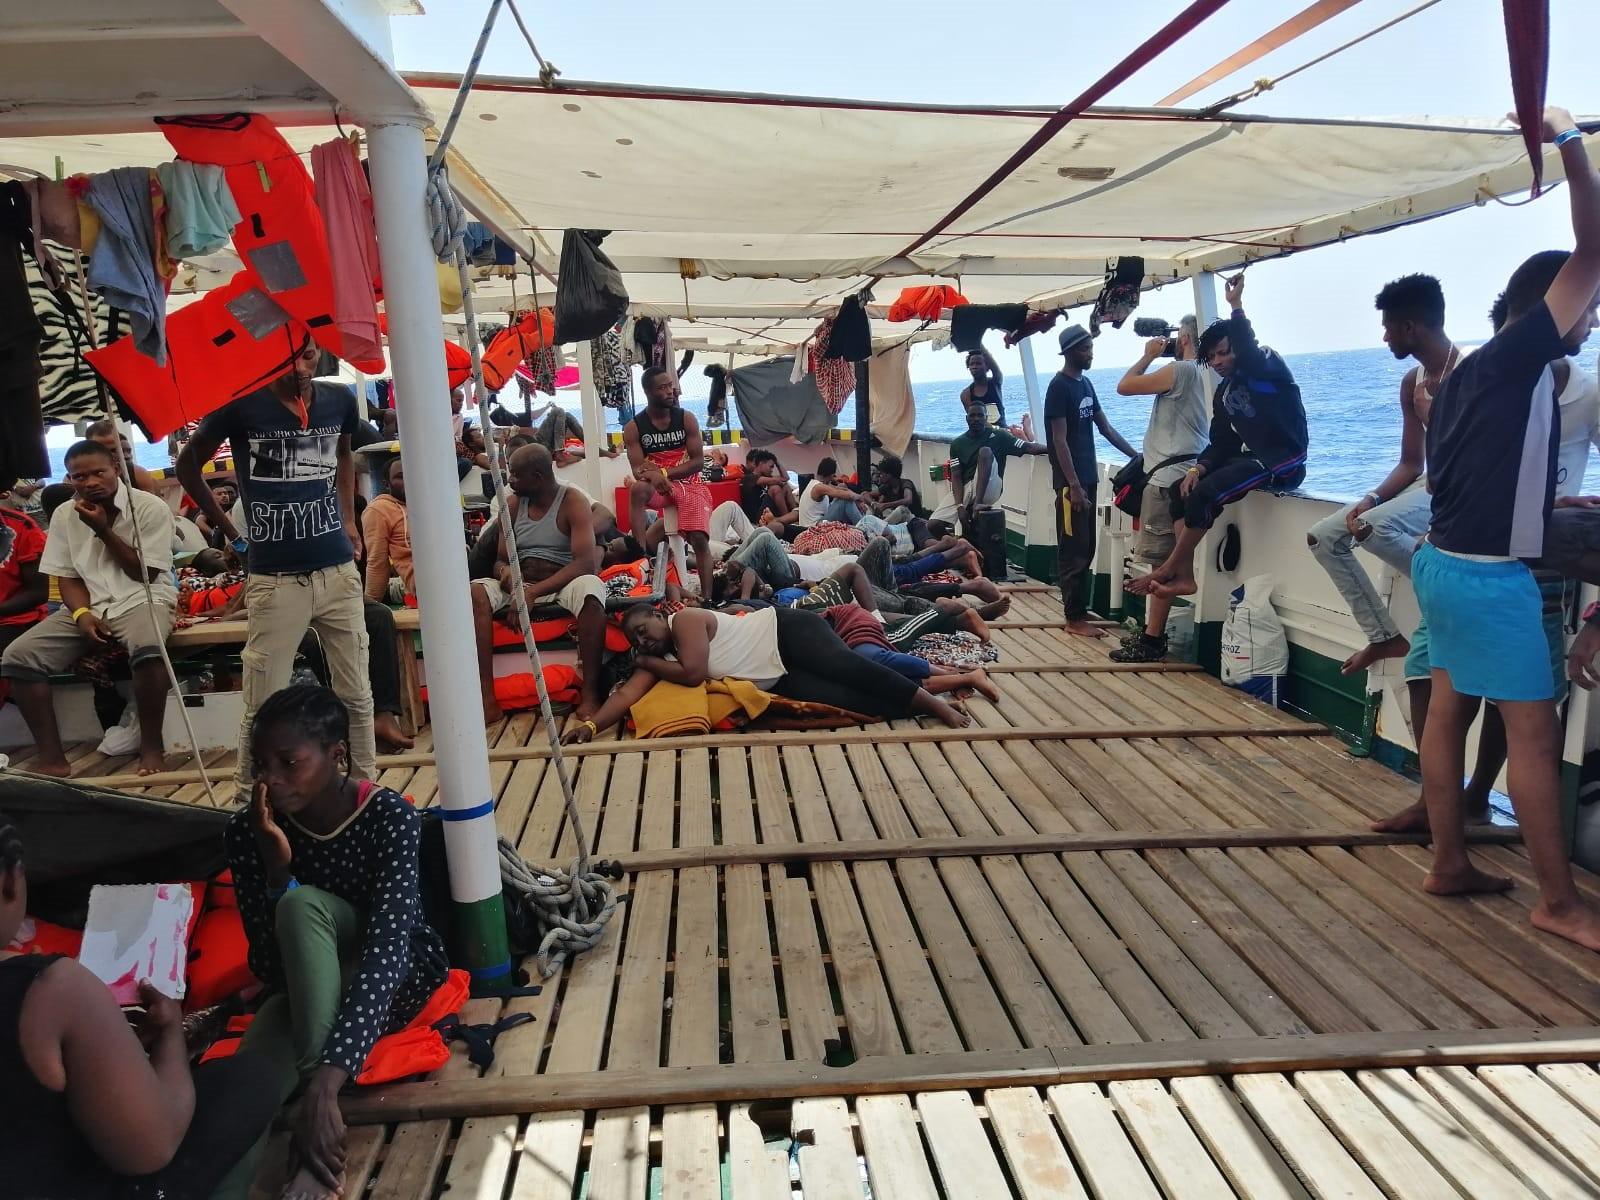 Italy_Mediterranean_Hope_Aboard_Open_Arms.jpg